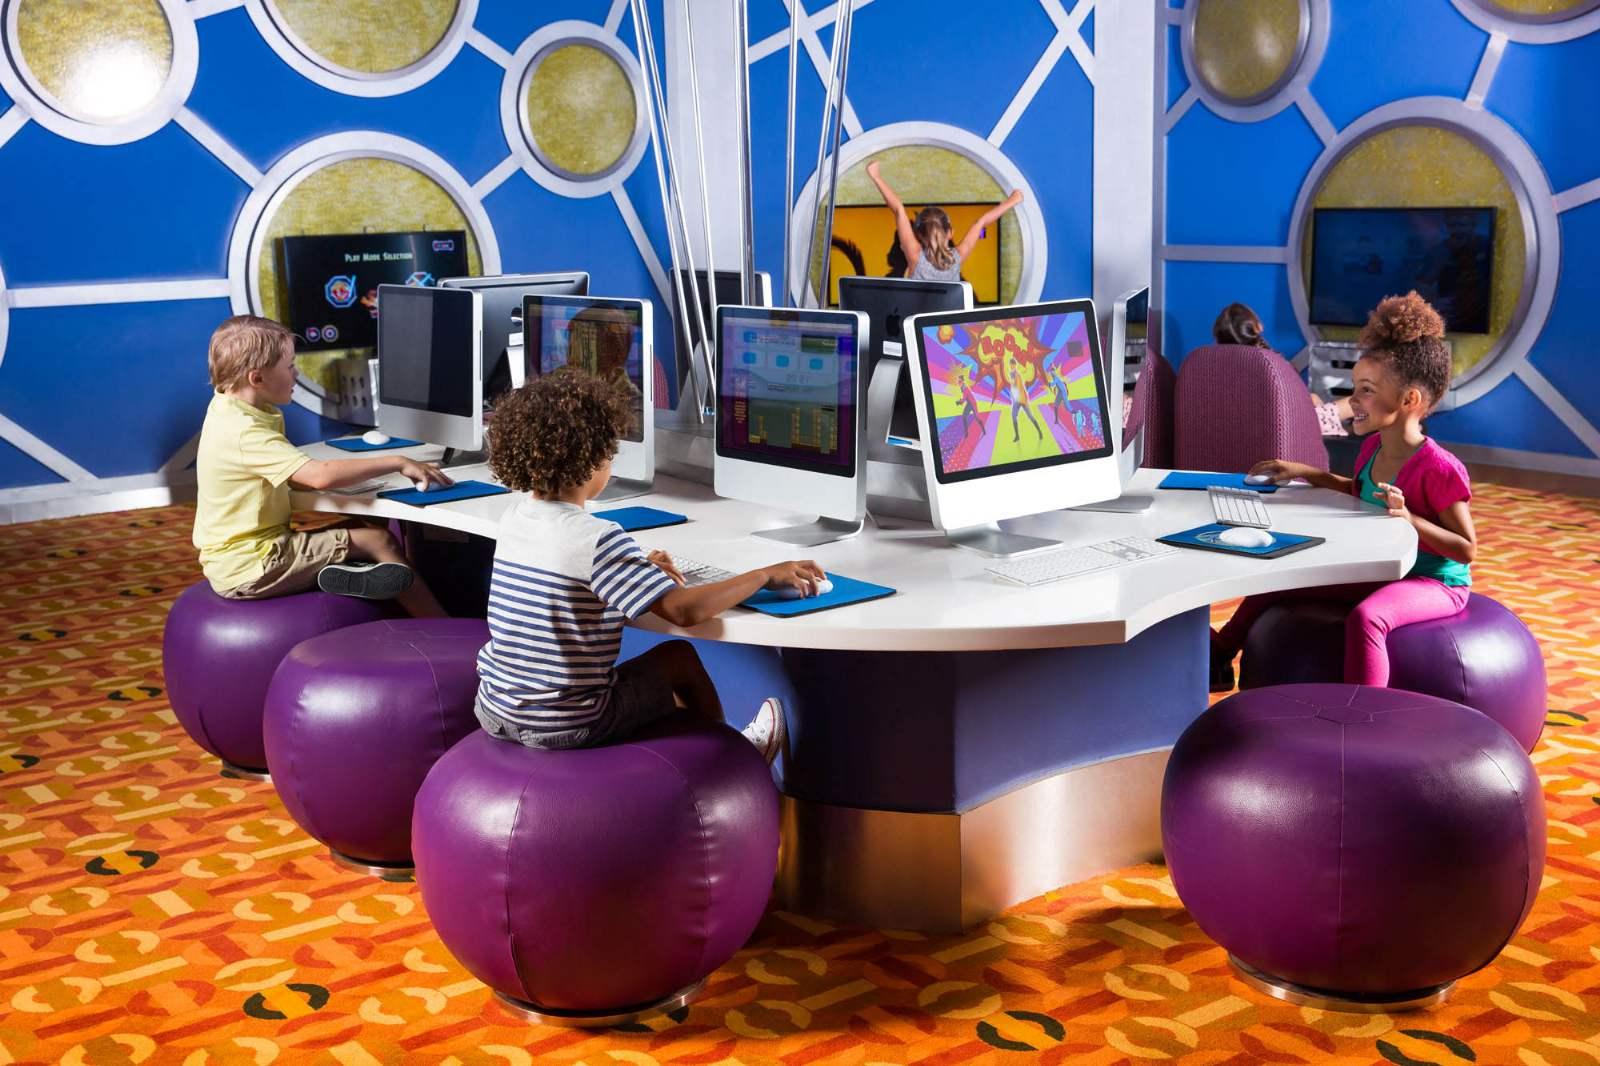 Atlantis, The Palm - Kids Command Centre